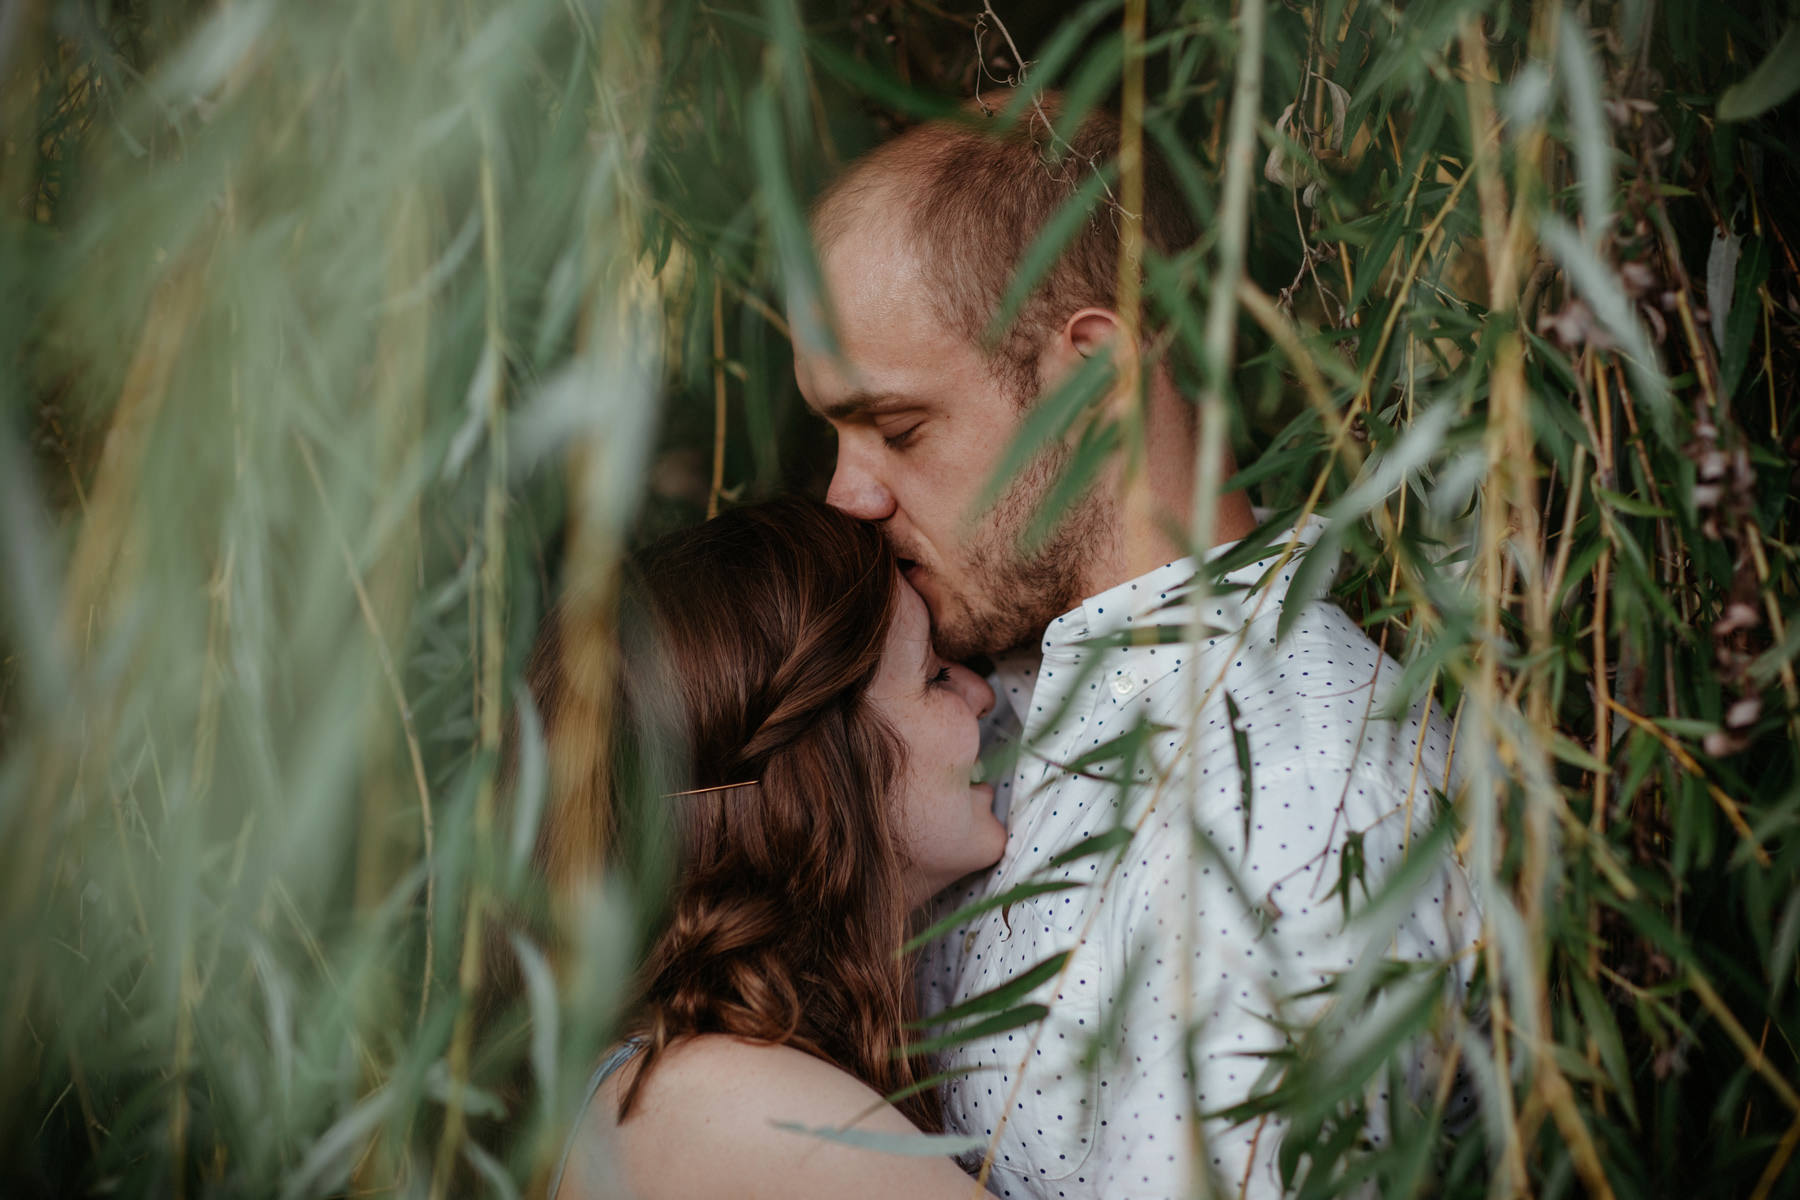 Kansas City_Penn Valley Park_Engagement Session_Kindling Wedding Photography15.JPG